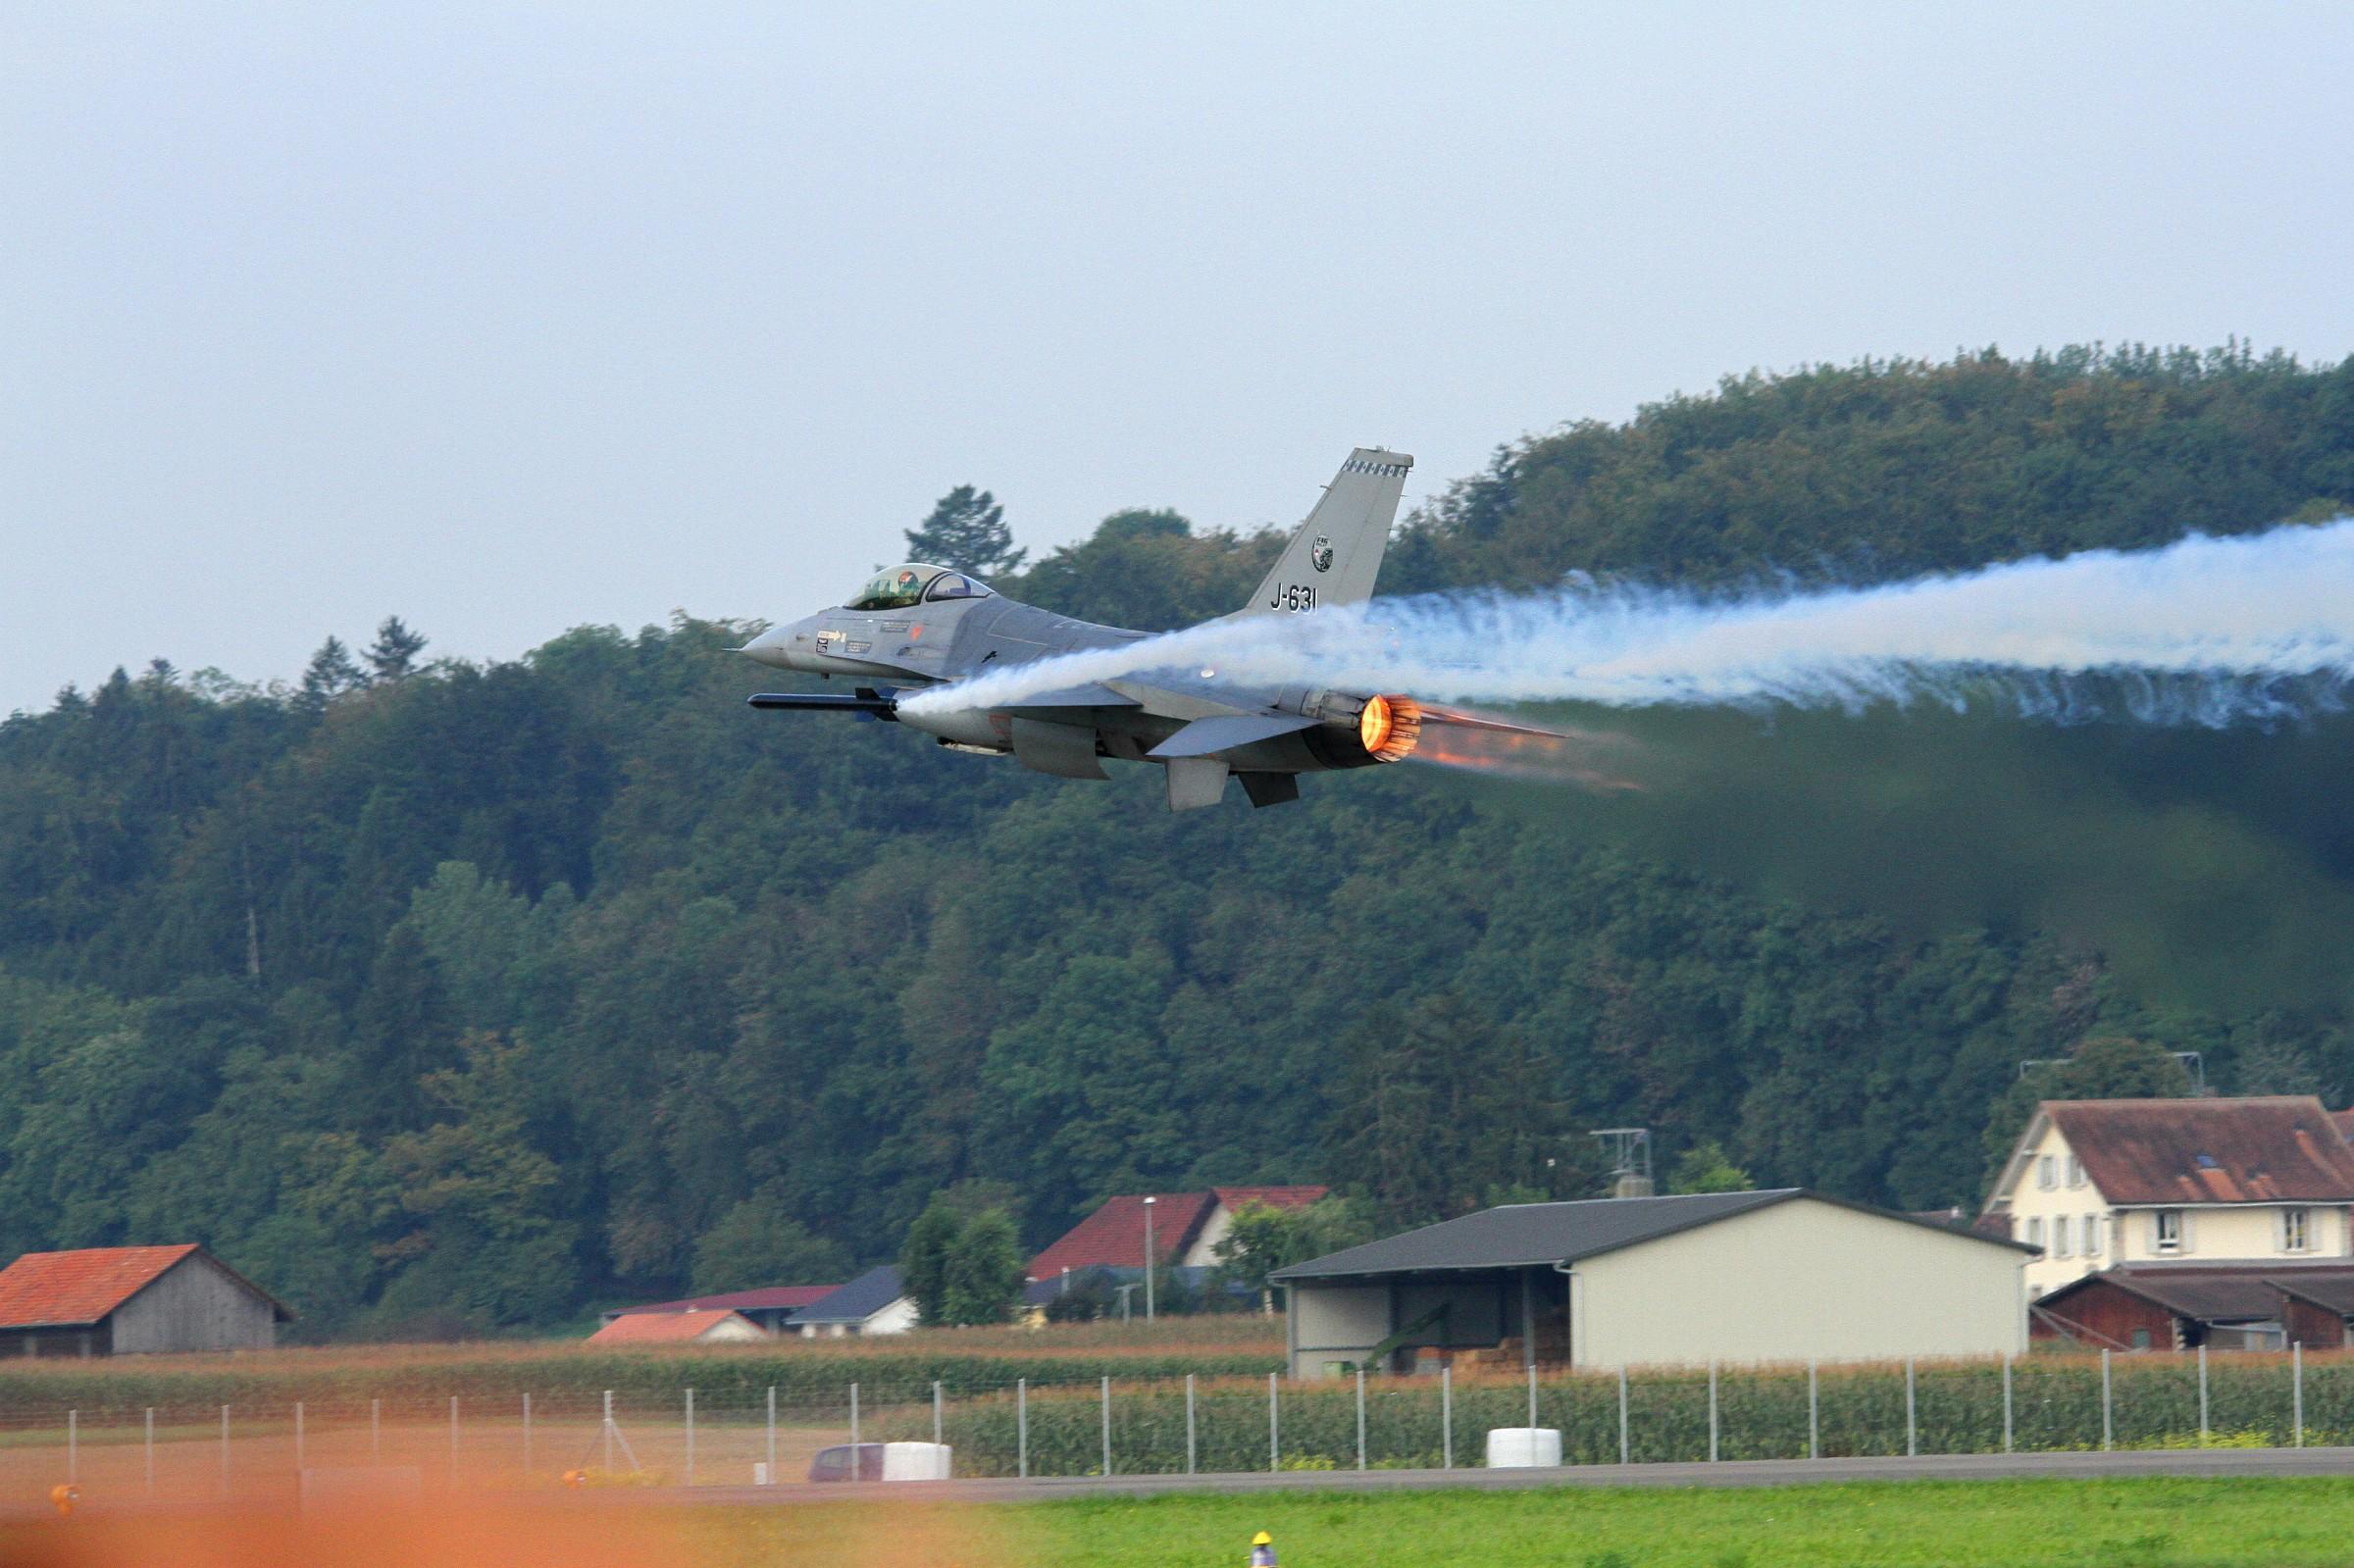 F16 - Decollo full power...